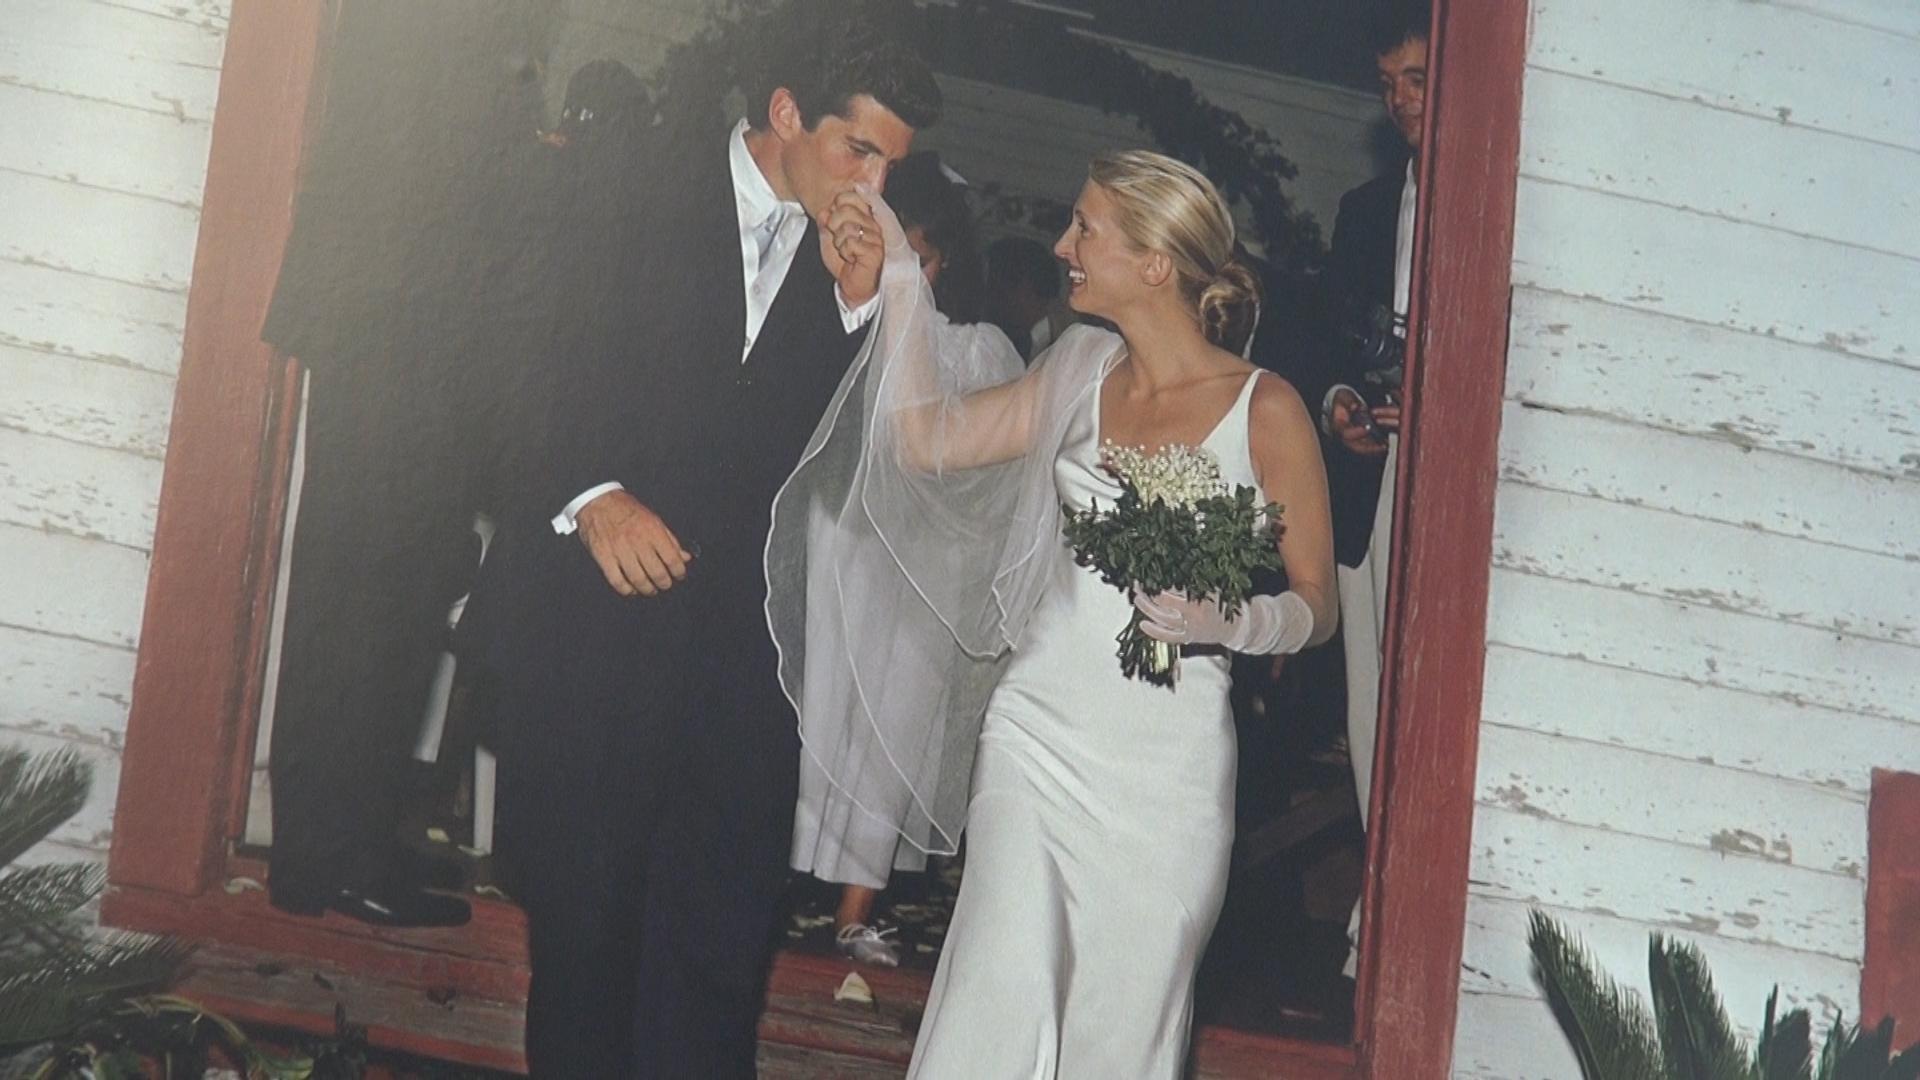 John F. Kennedy Jr. on his wedding day with Carolyn Bessette